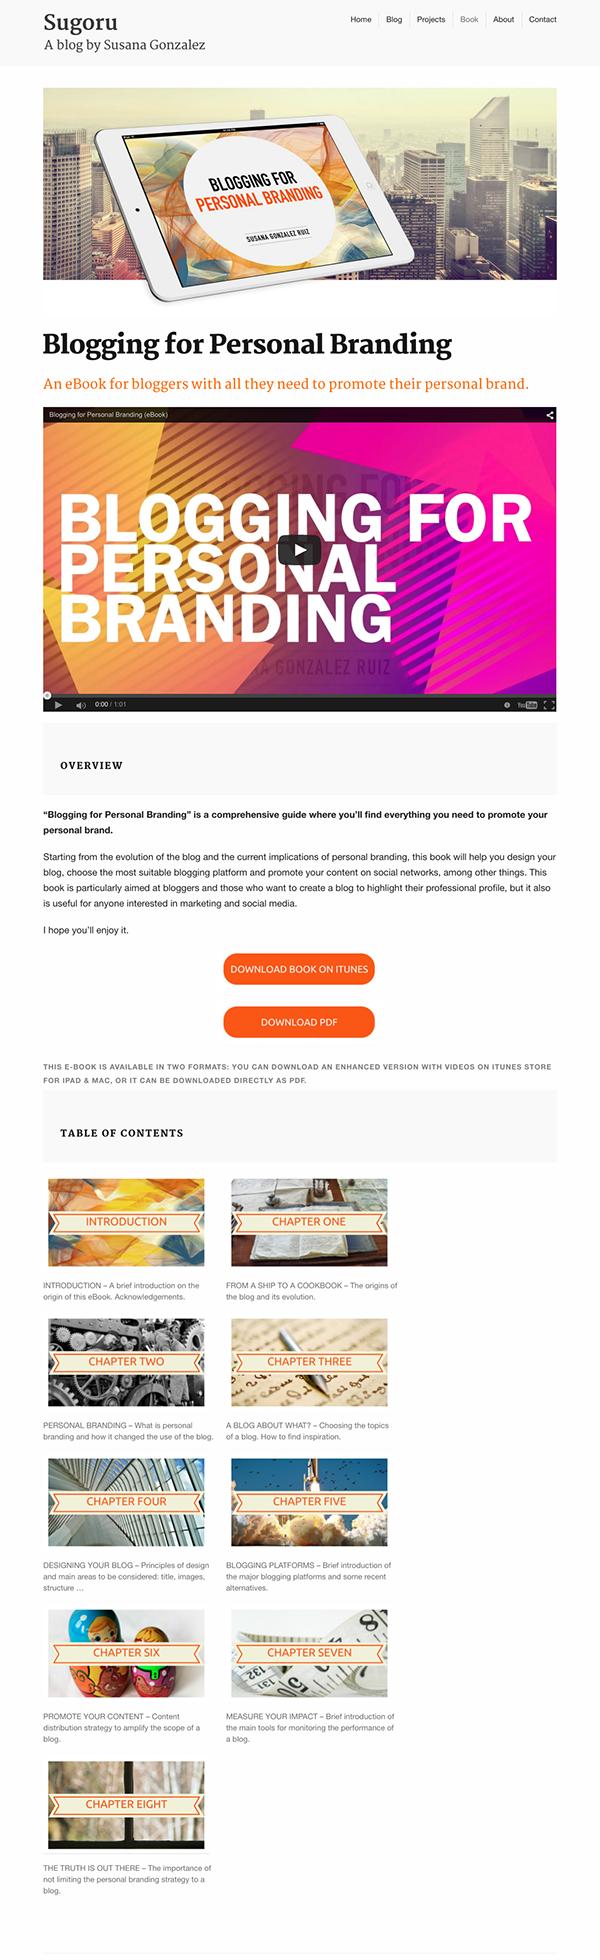 Blogging for Personal Branding (eBook) on Behance